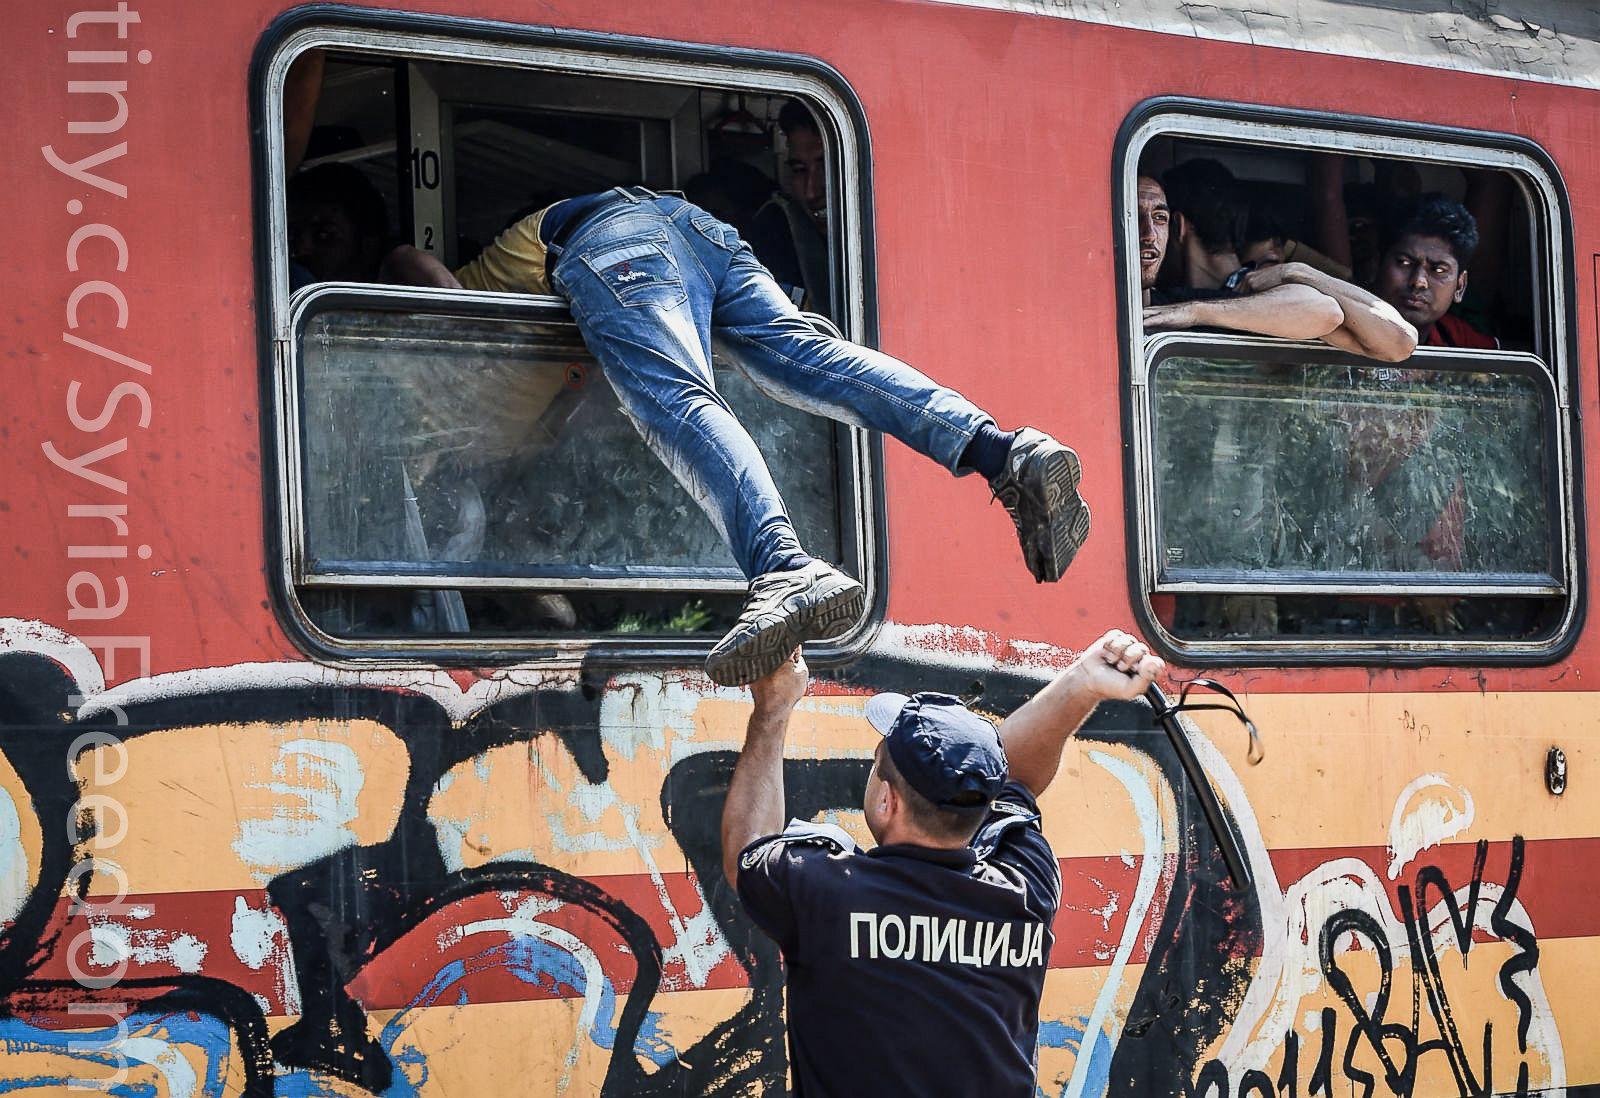 EPA_migrant_crisis_24_mm_150821_16x11_1600.jpg | by FreedomHouse